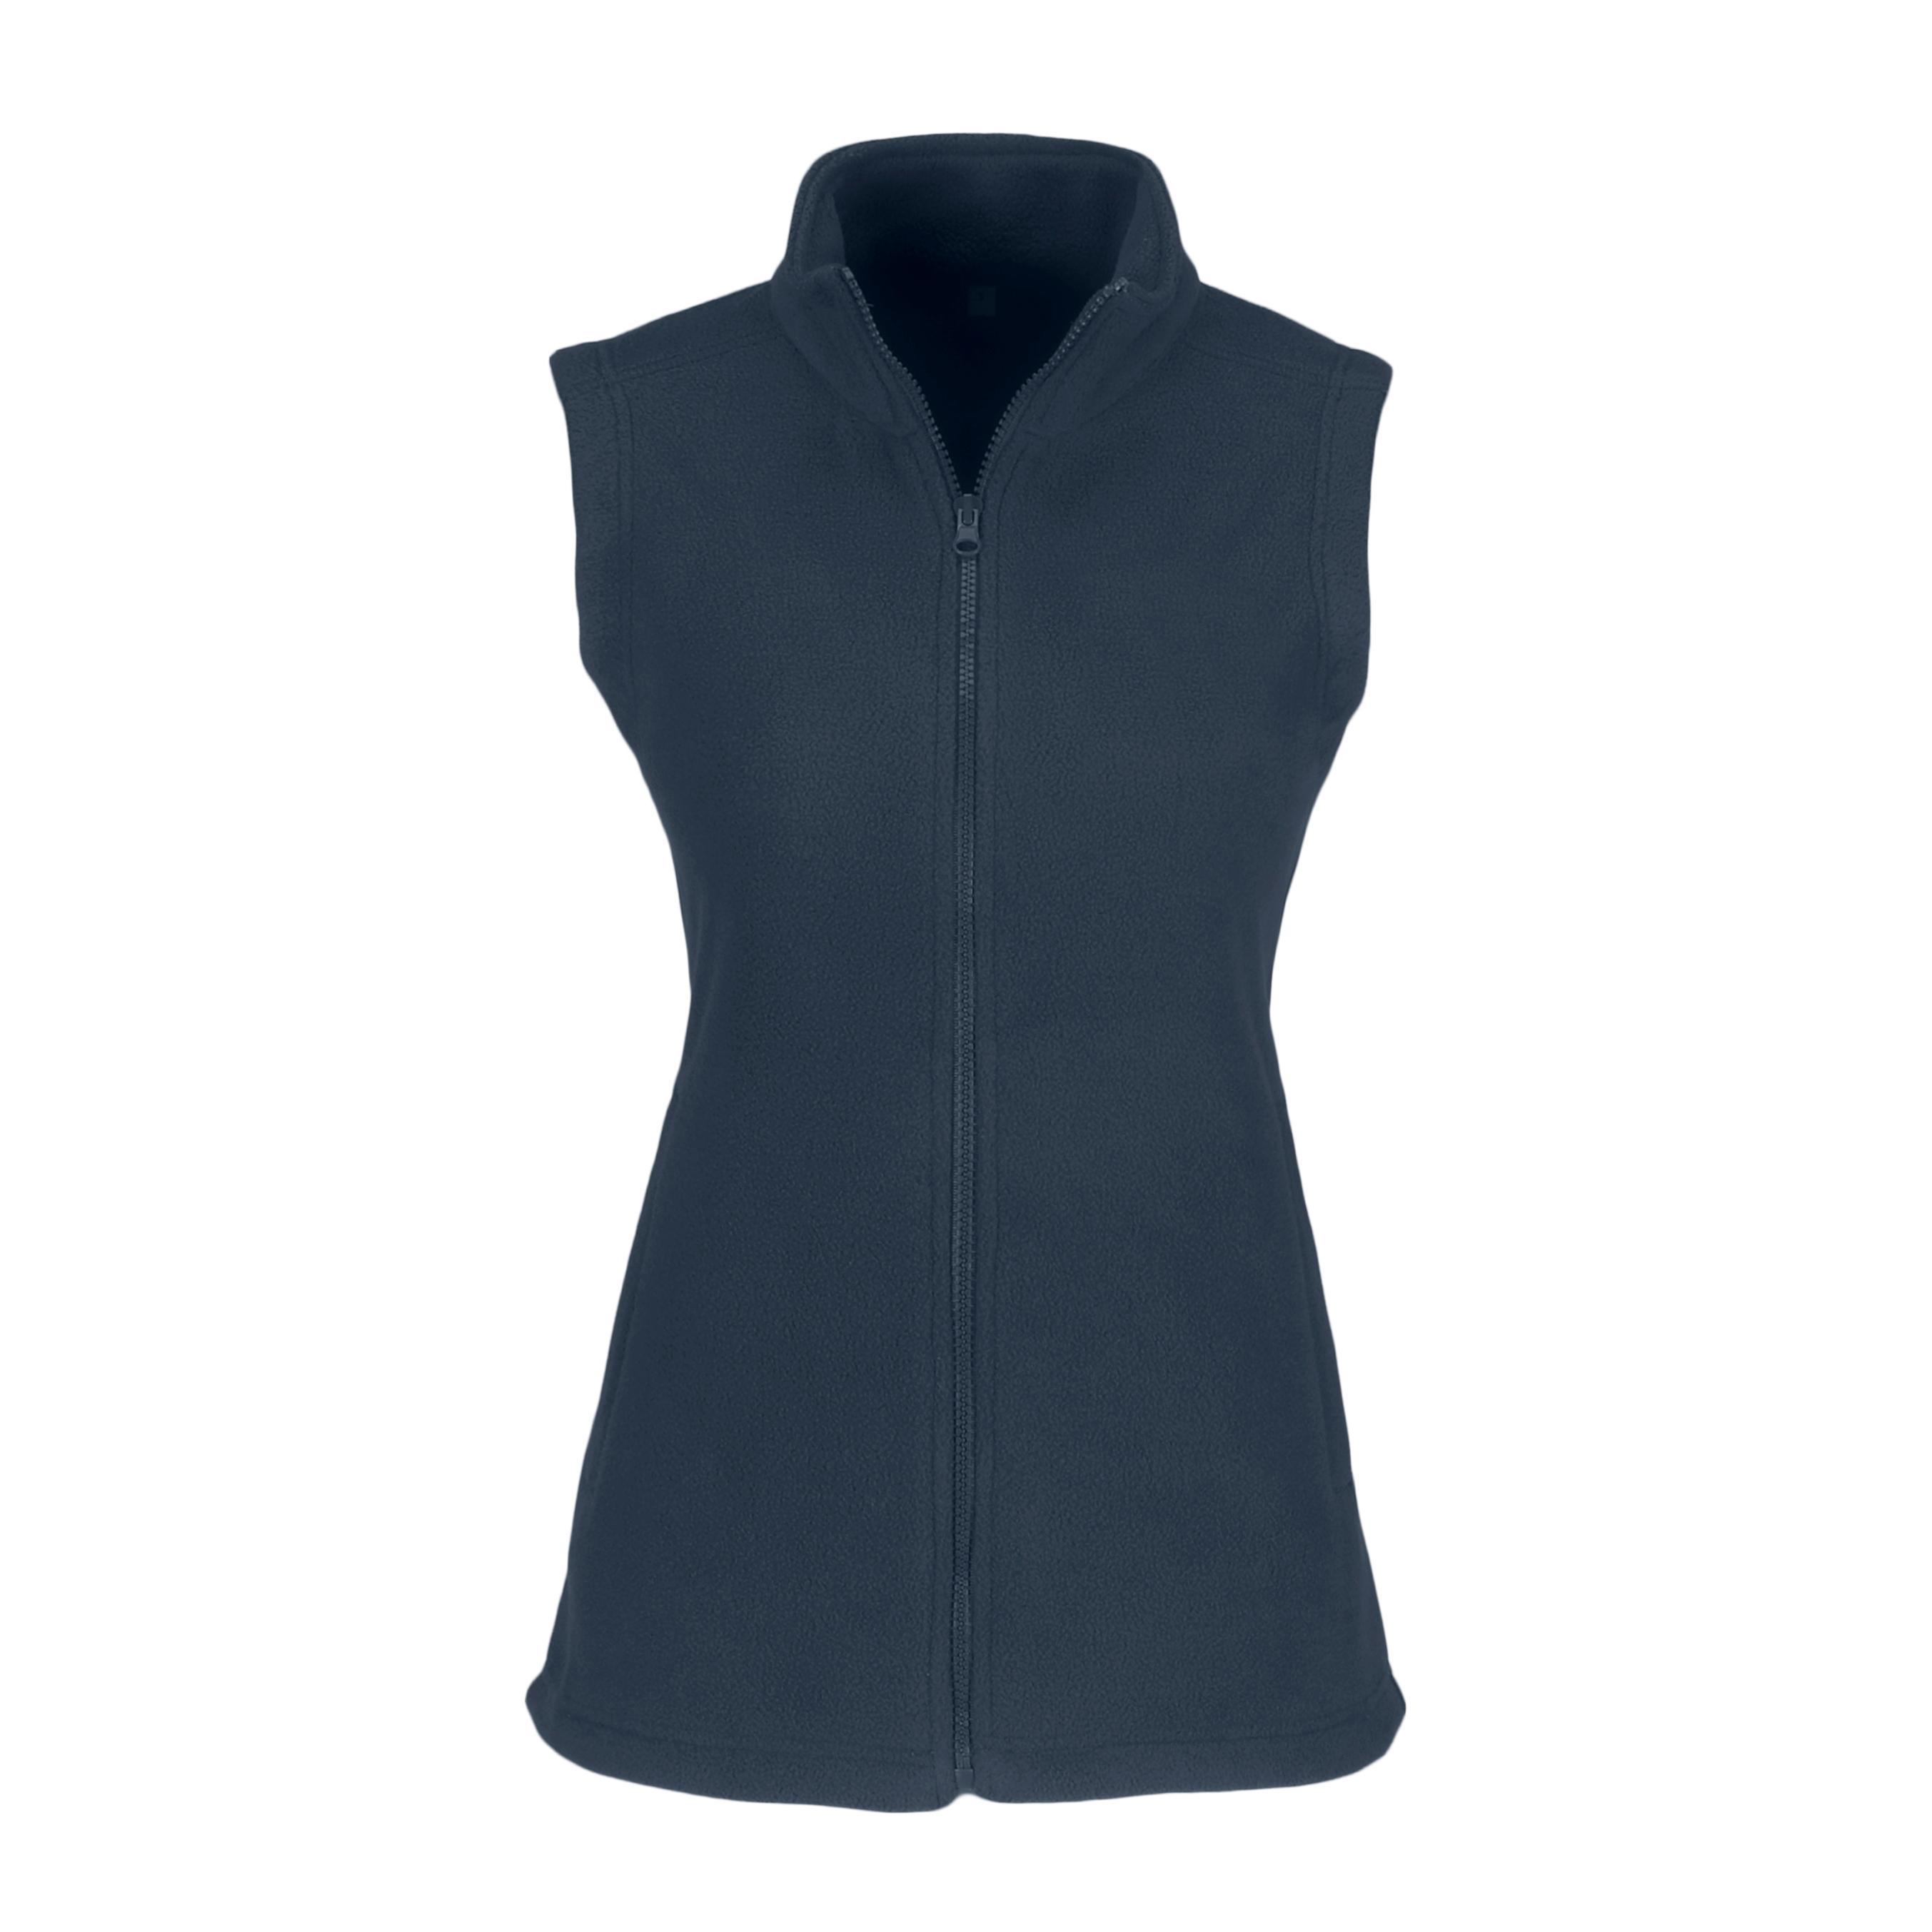 Ladies Yukon Micro Fleece Bodywarmer - Navy Only